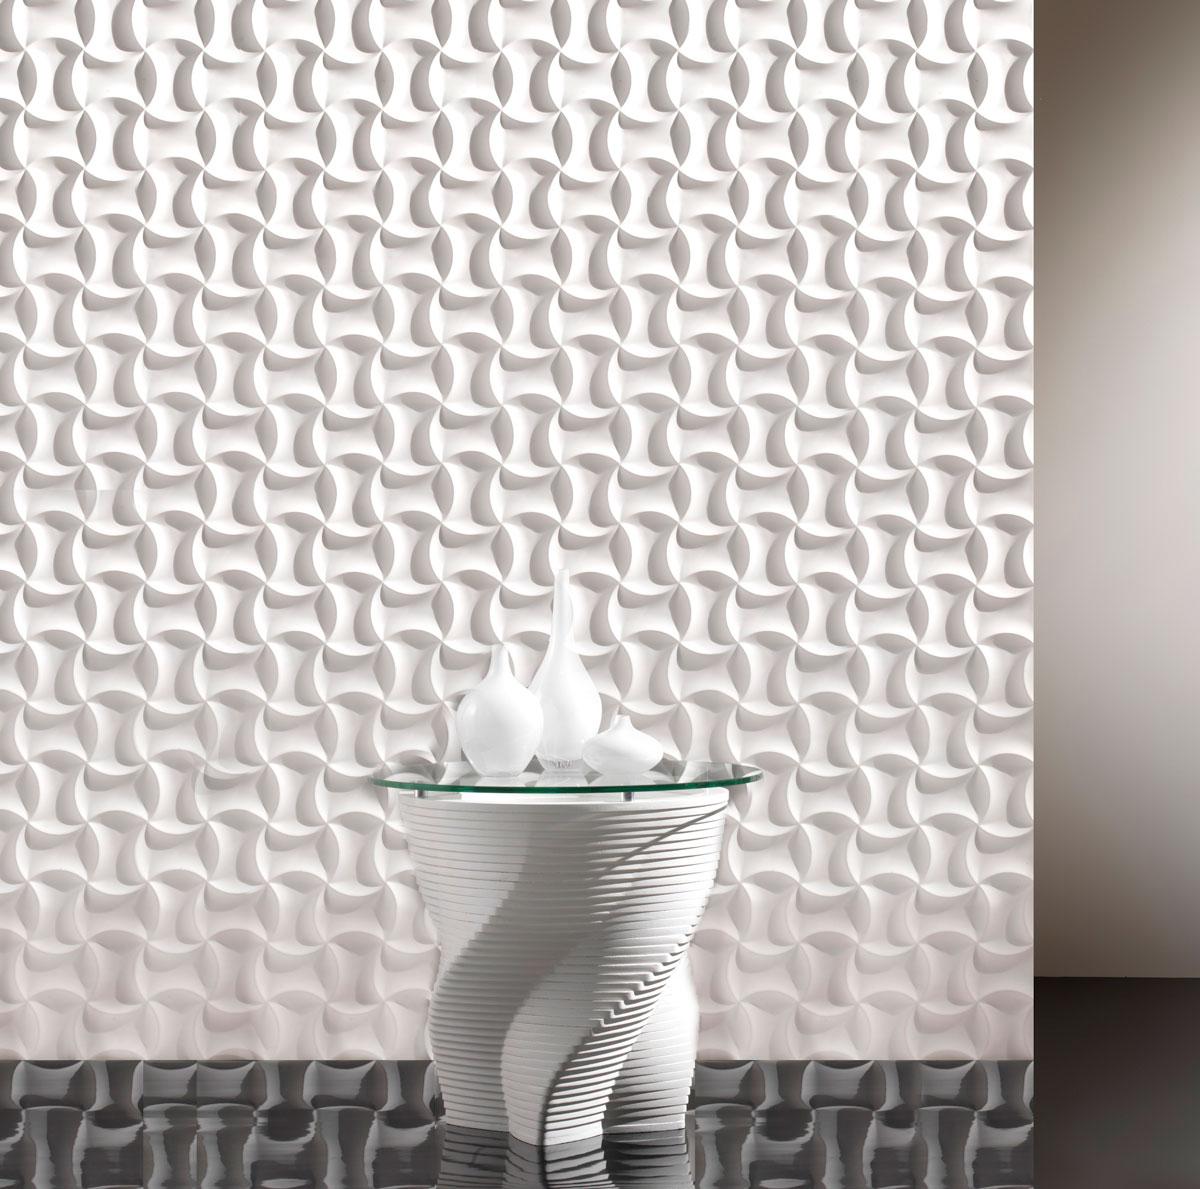 Textured Gypsum Wall Panels